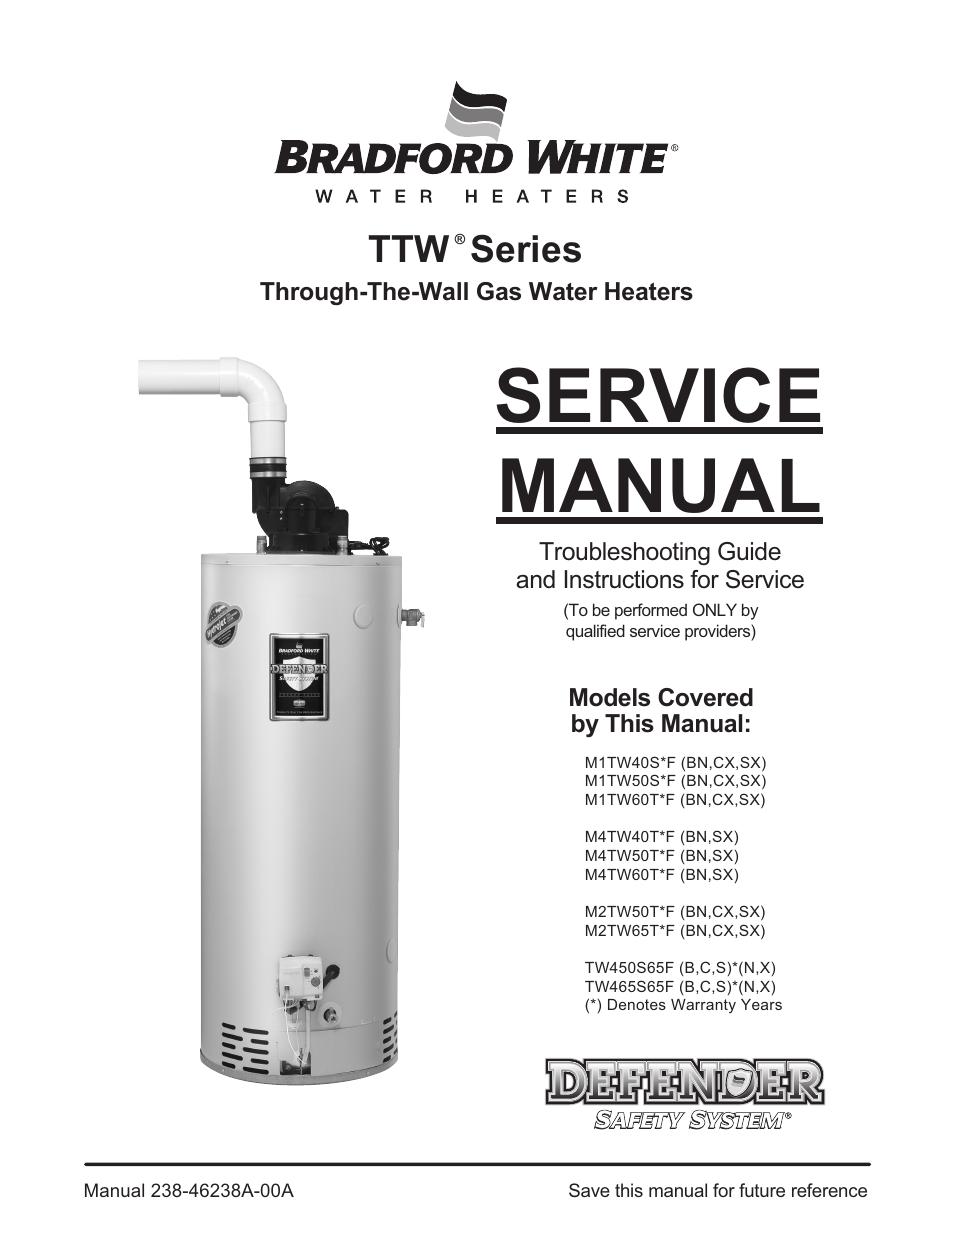 bradford white m 2 tw 75t6bn user manual 40 pages also for m 2 rh manualsdir com bradford white mi5036fbn service manual 75 Gallon Bradford White